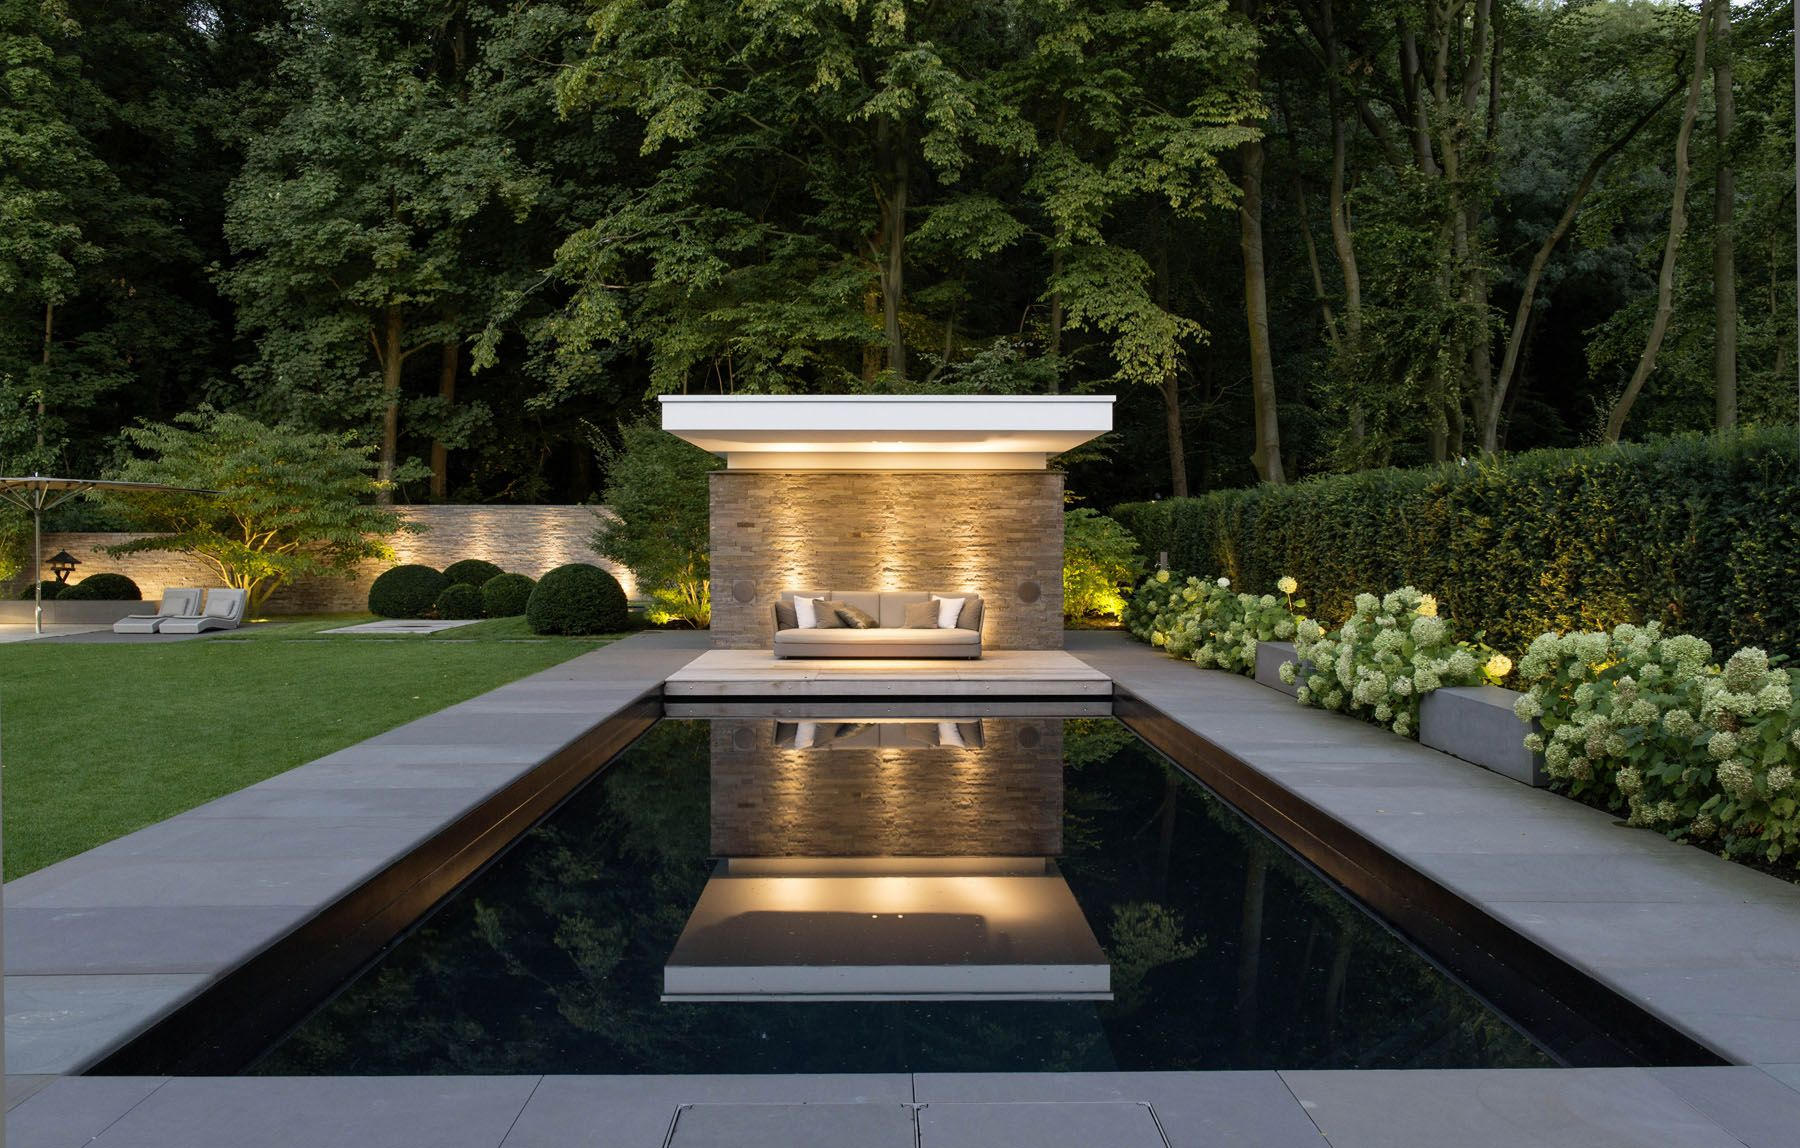 Moderne Gartenarchitektur Koln Villengarten 1 Gartenplus Die Gartenarchitekten Gartenarchitektur Gartendesign Ideen Gartenarchitekt